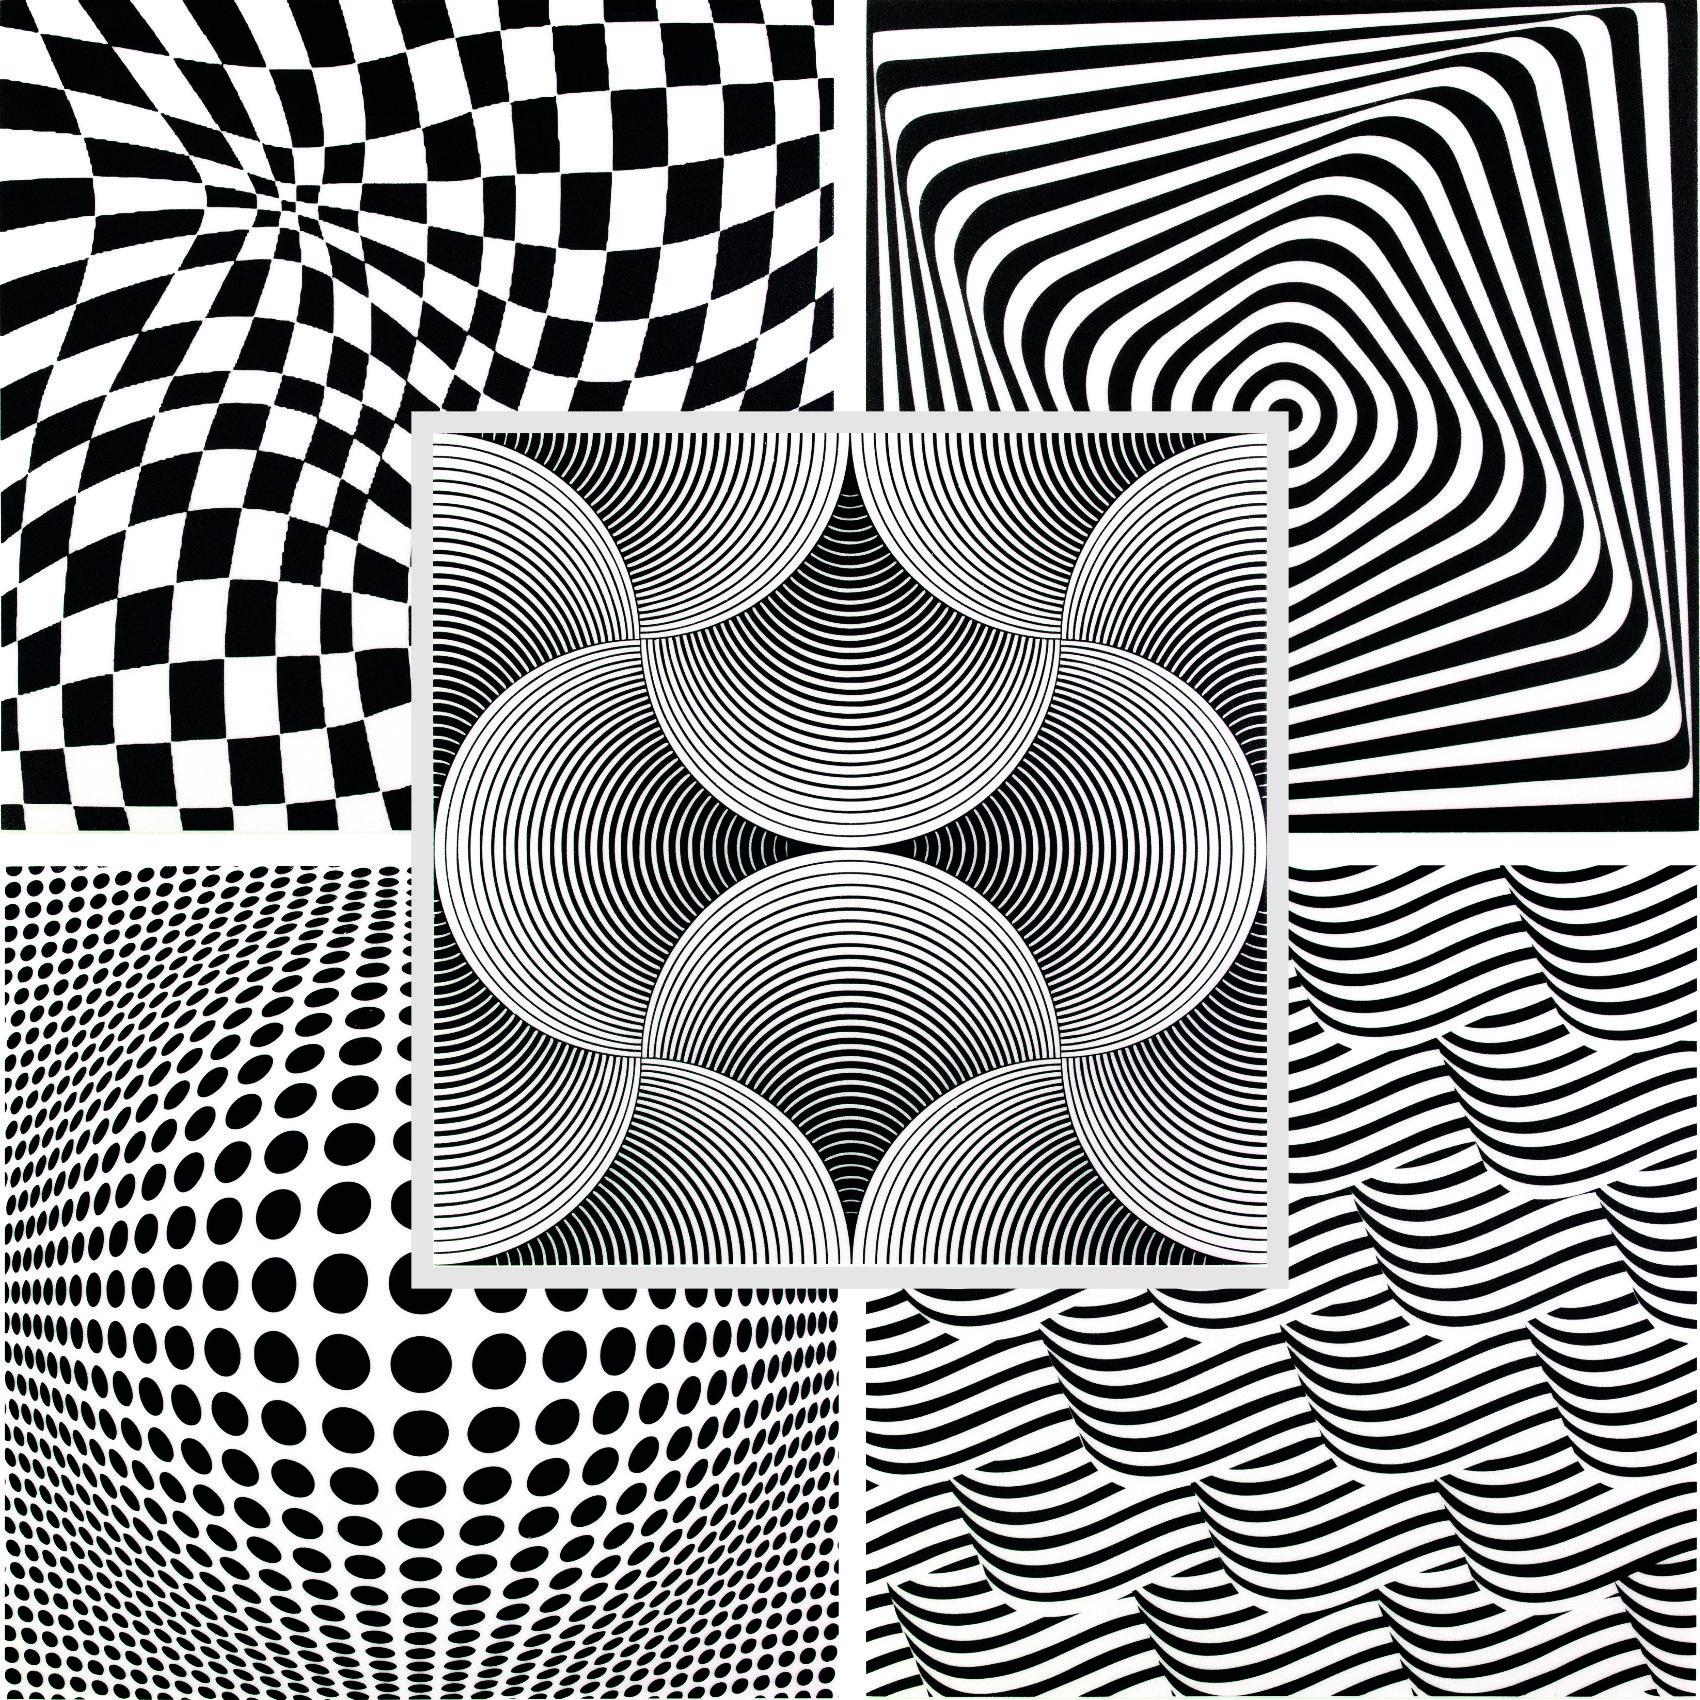 2 qm | Deckenplatten | Panorama Effekt | XPS | 50x50cm |Hexim | Black